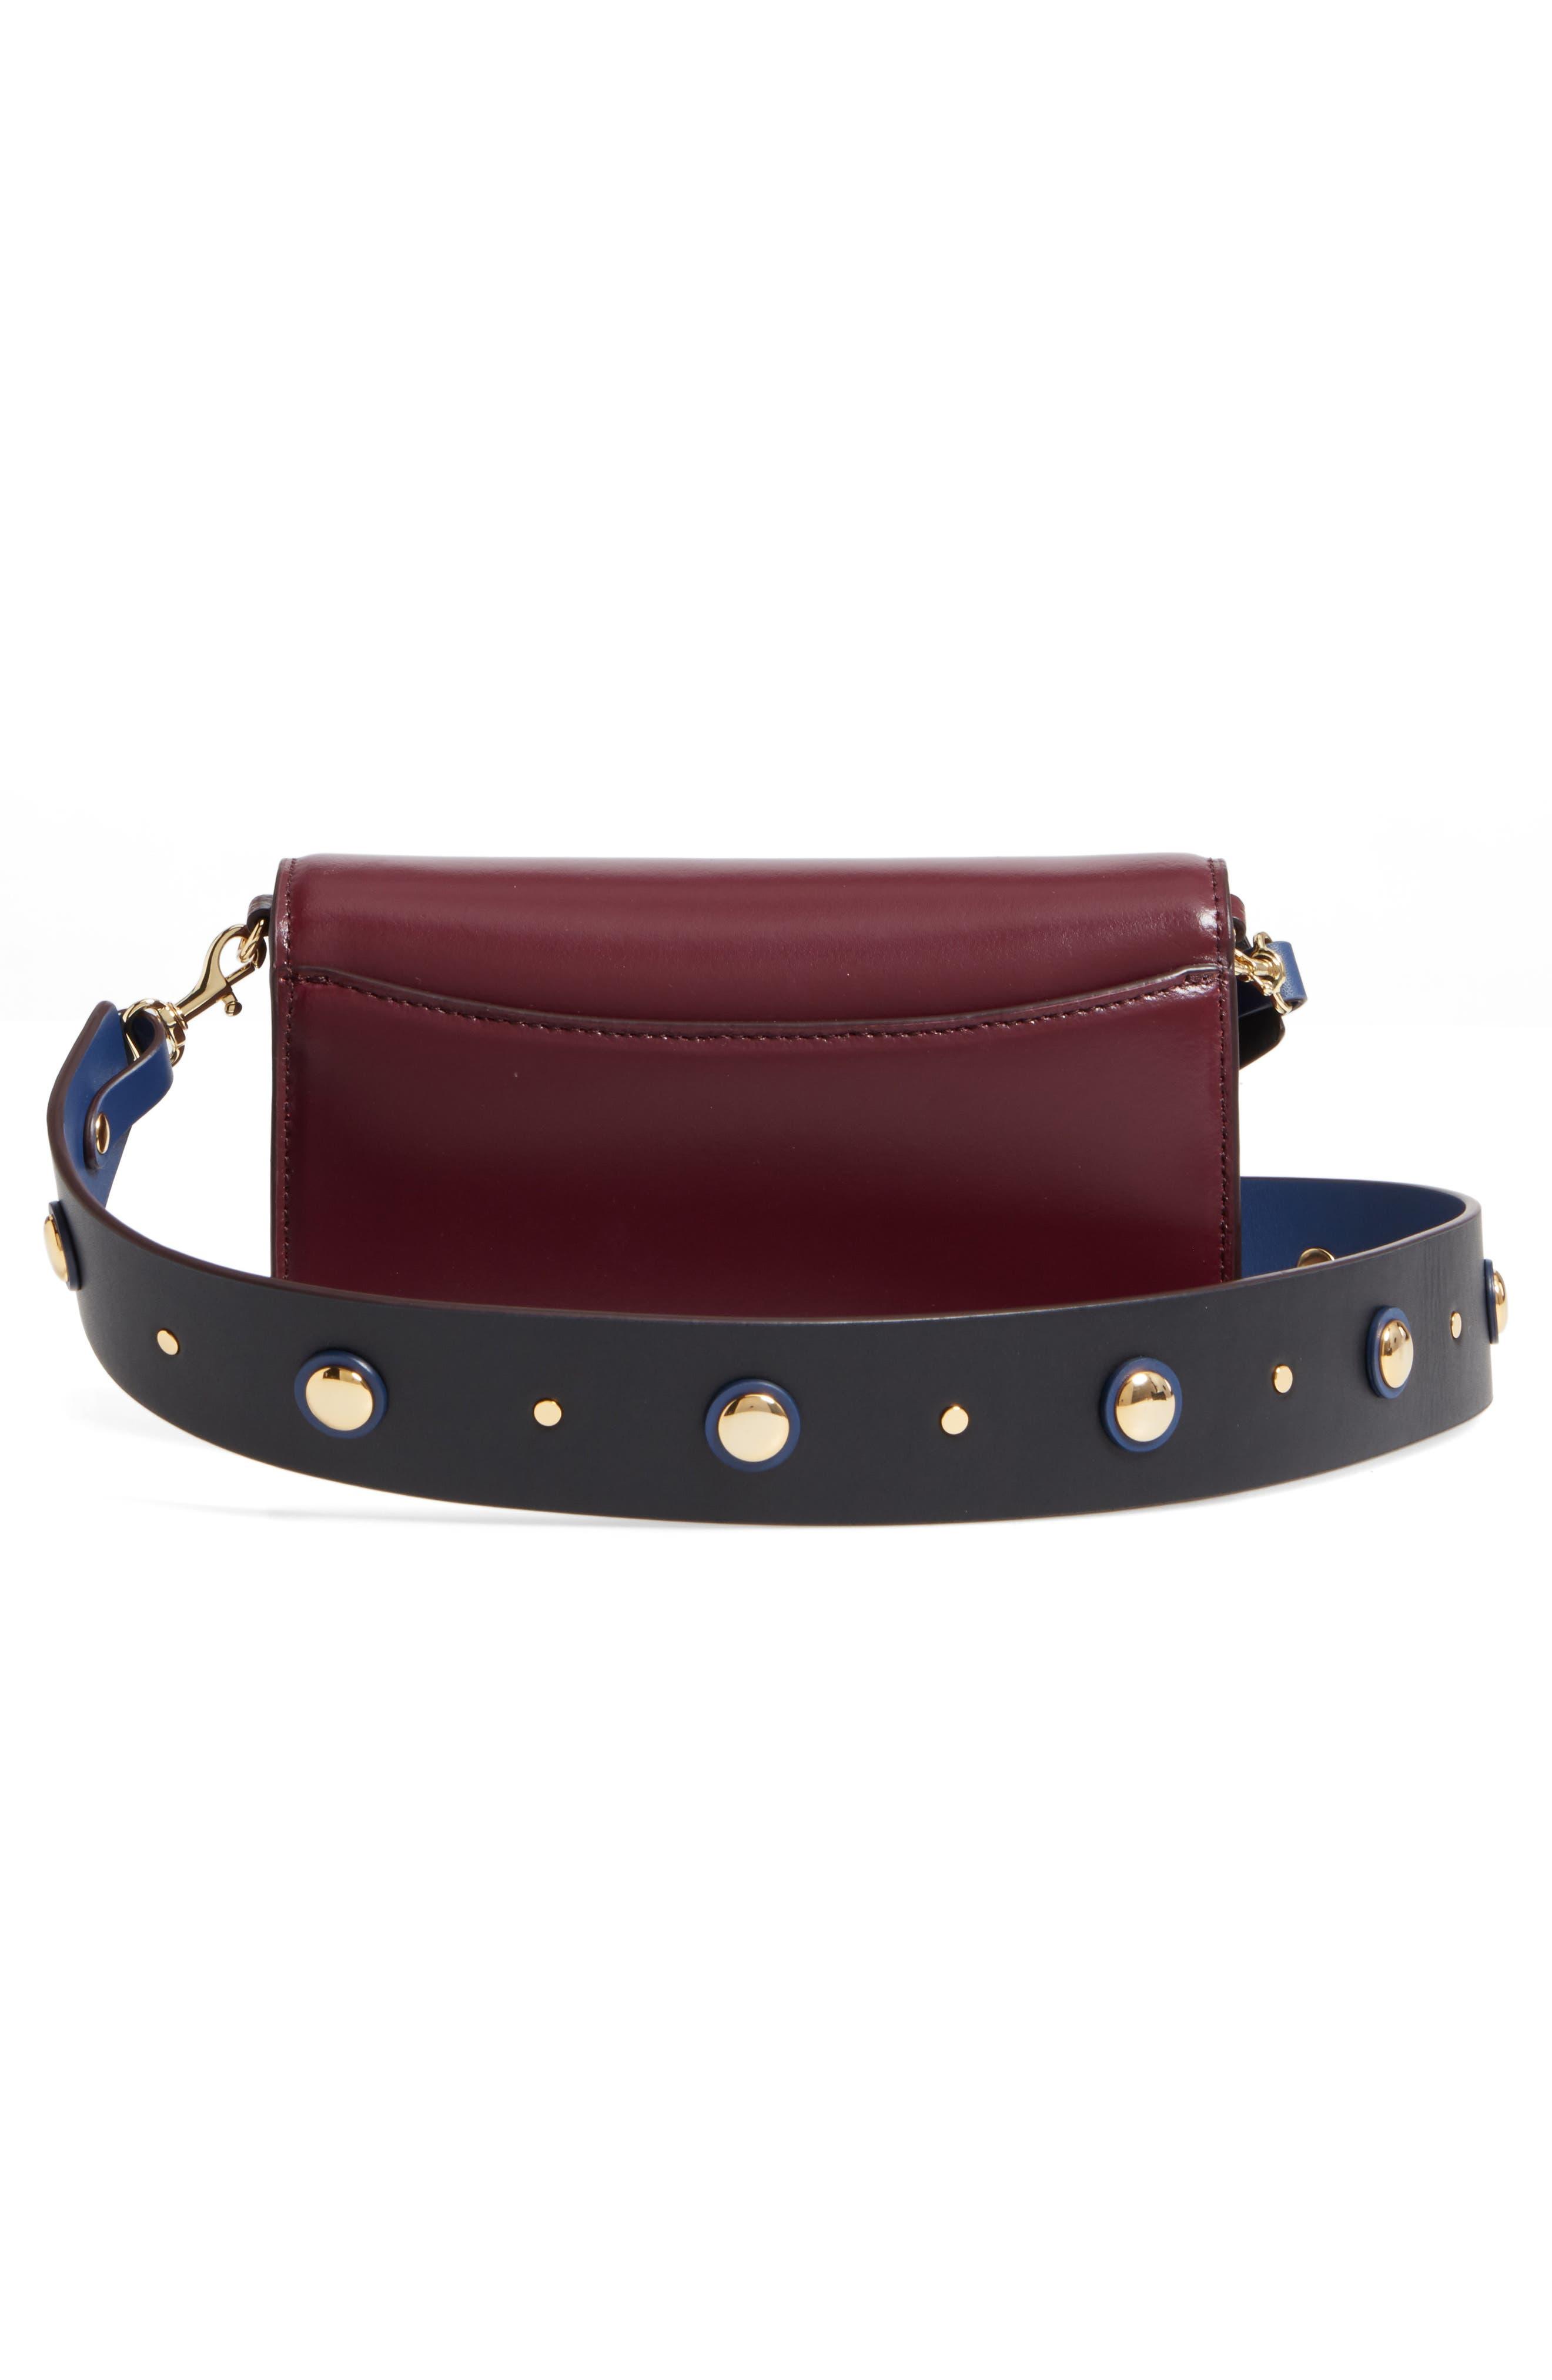 Soirée Leather Convertible Crossbody Bag,                             Alternate thumbnail 12, color,